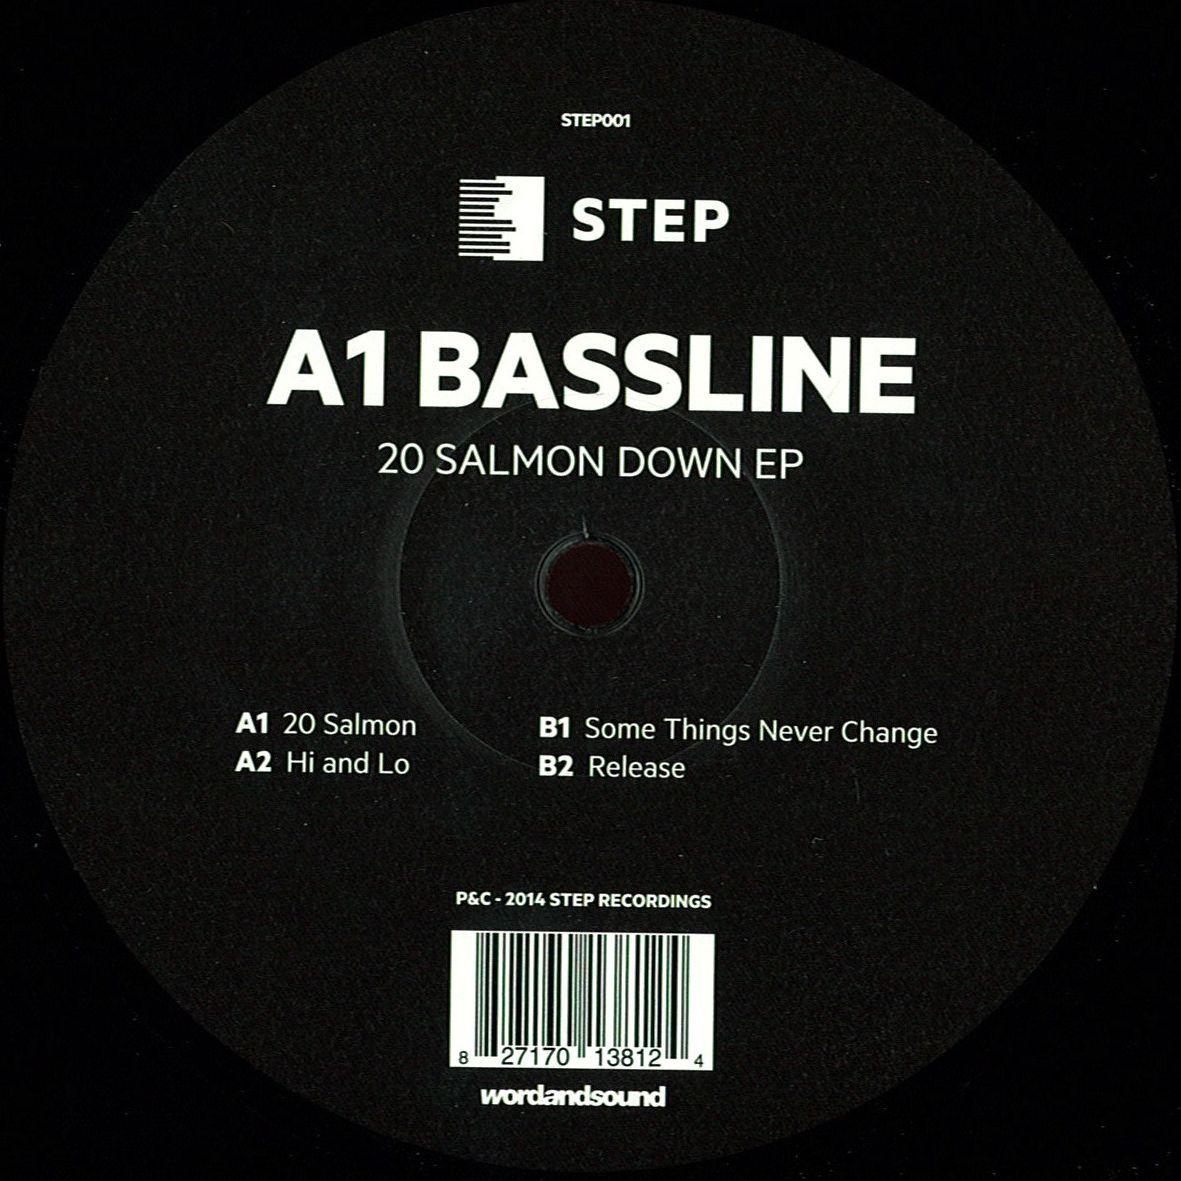 A1 Bassline - 20 Salmon Down EP [STEP001]